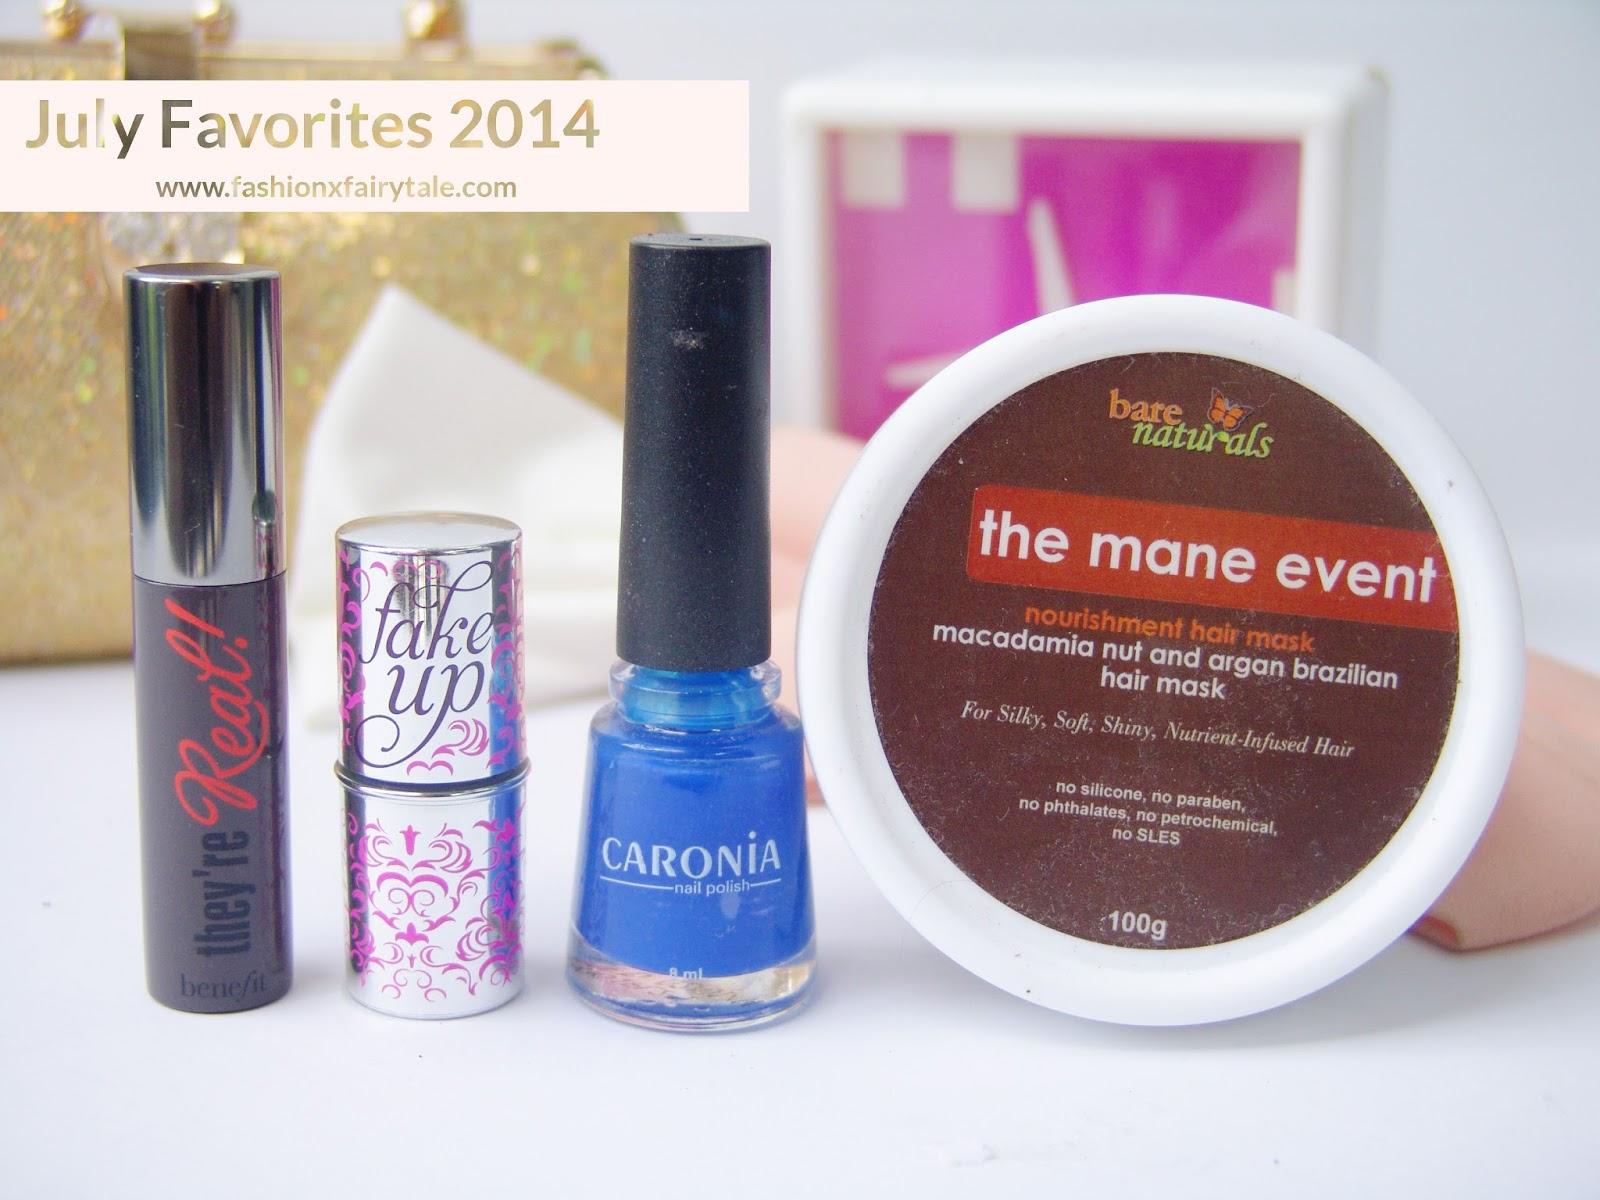 July Favorites 2014